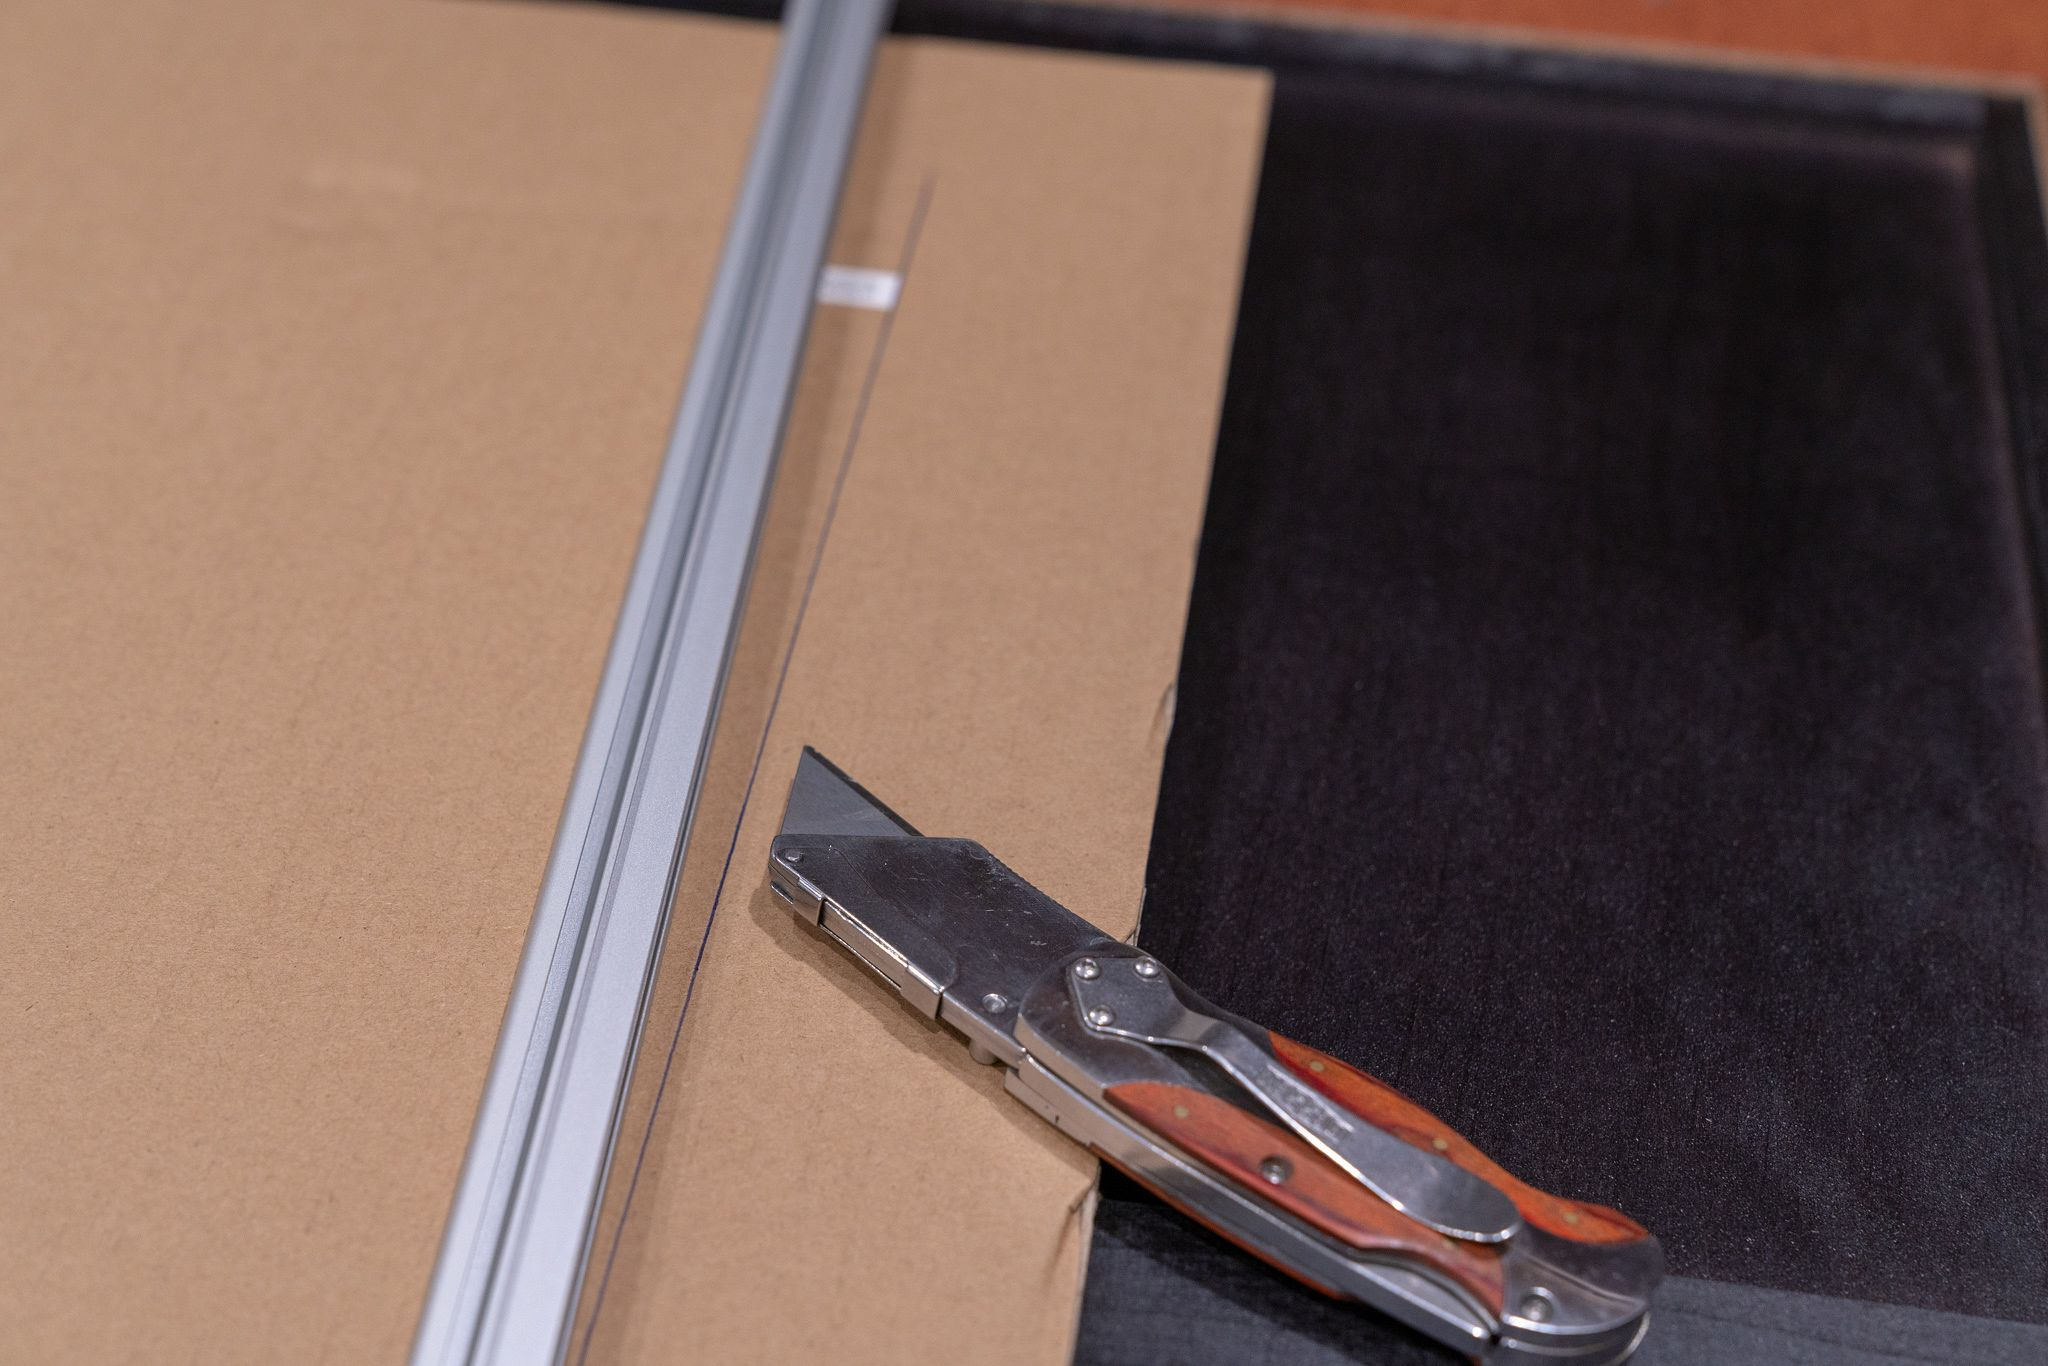 Scoring the dry-erase board